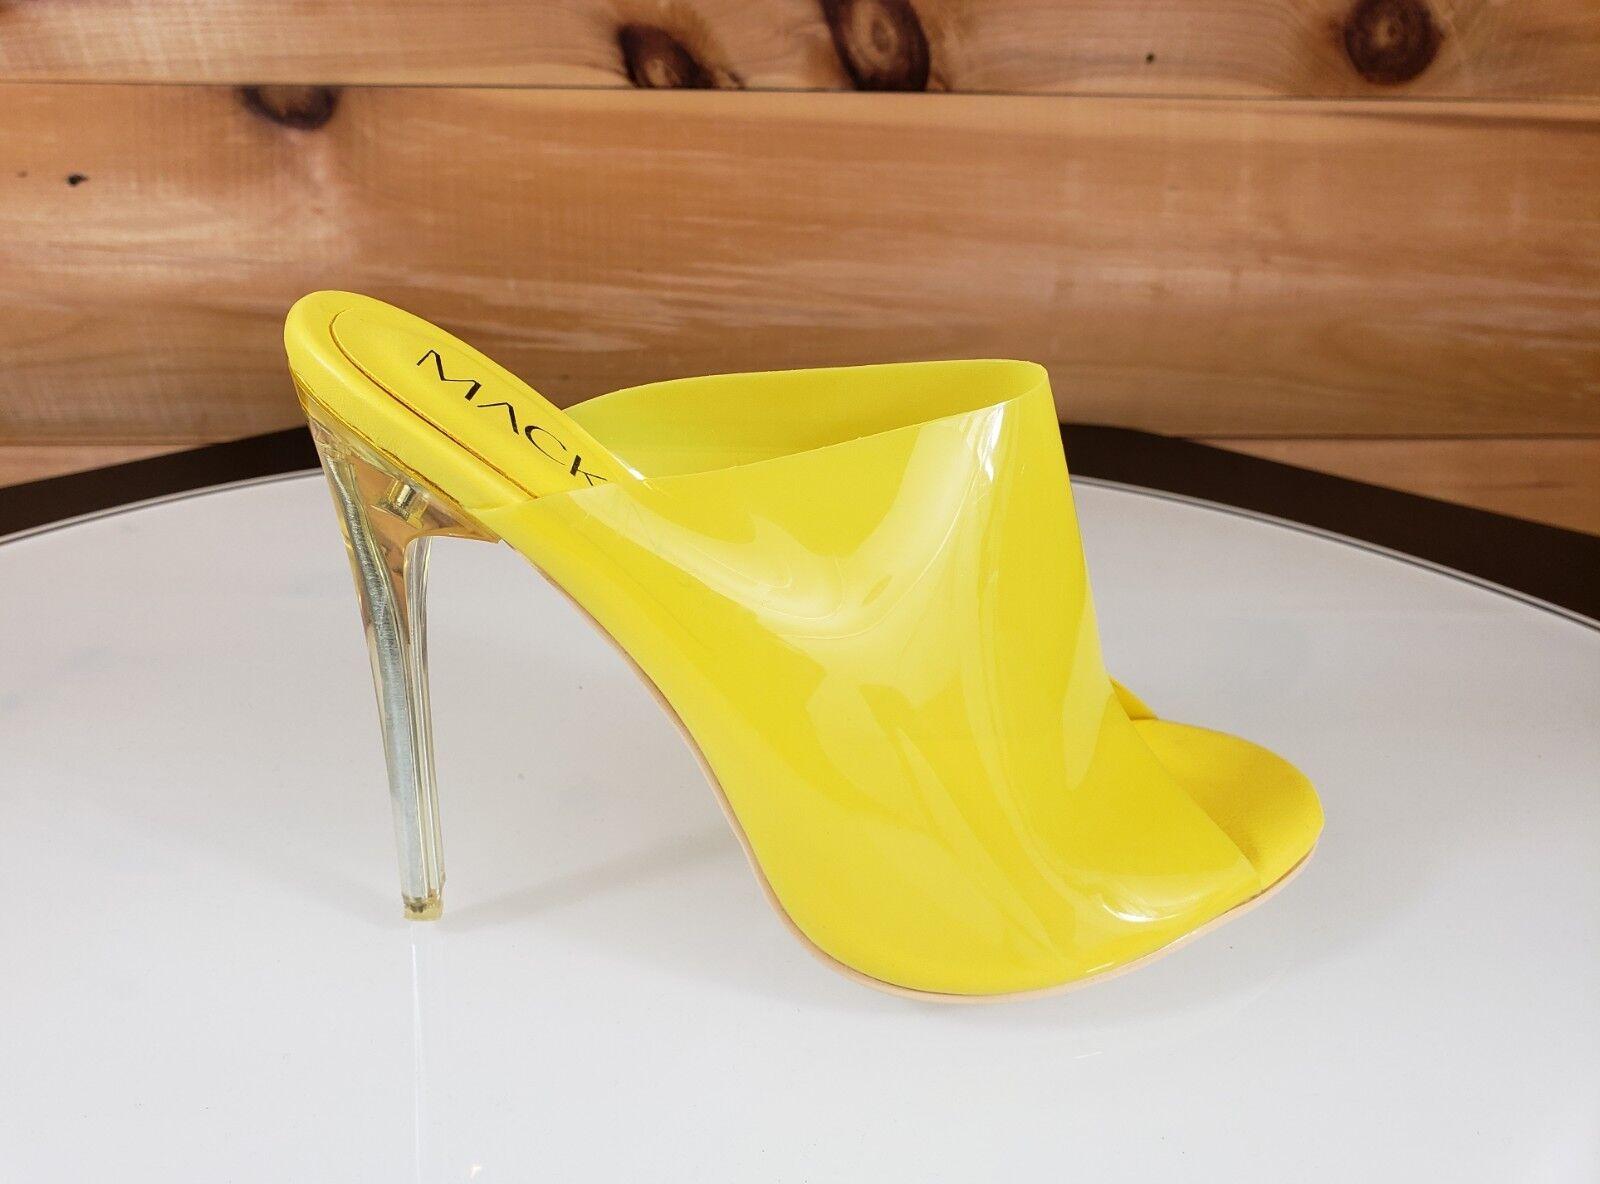 Mac J Opaque Yellow Open Toe Slip On Mule Clog 4.5 High Heel 7- 11